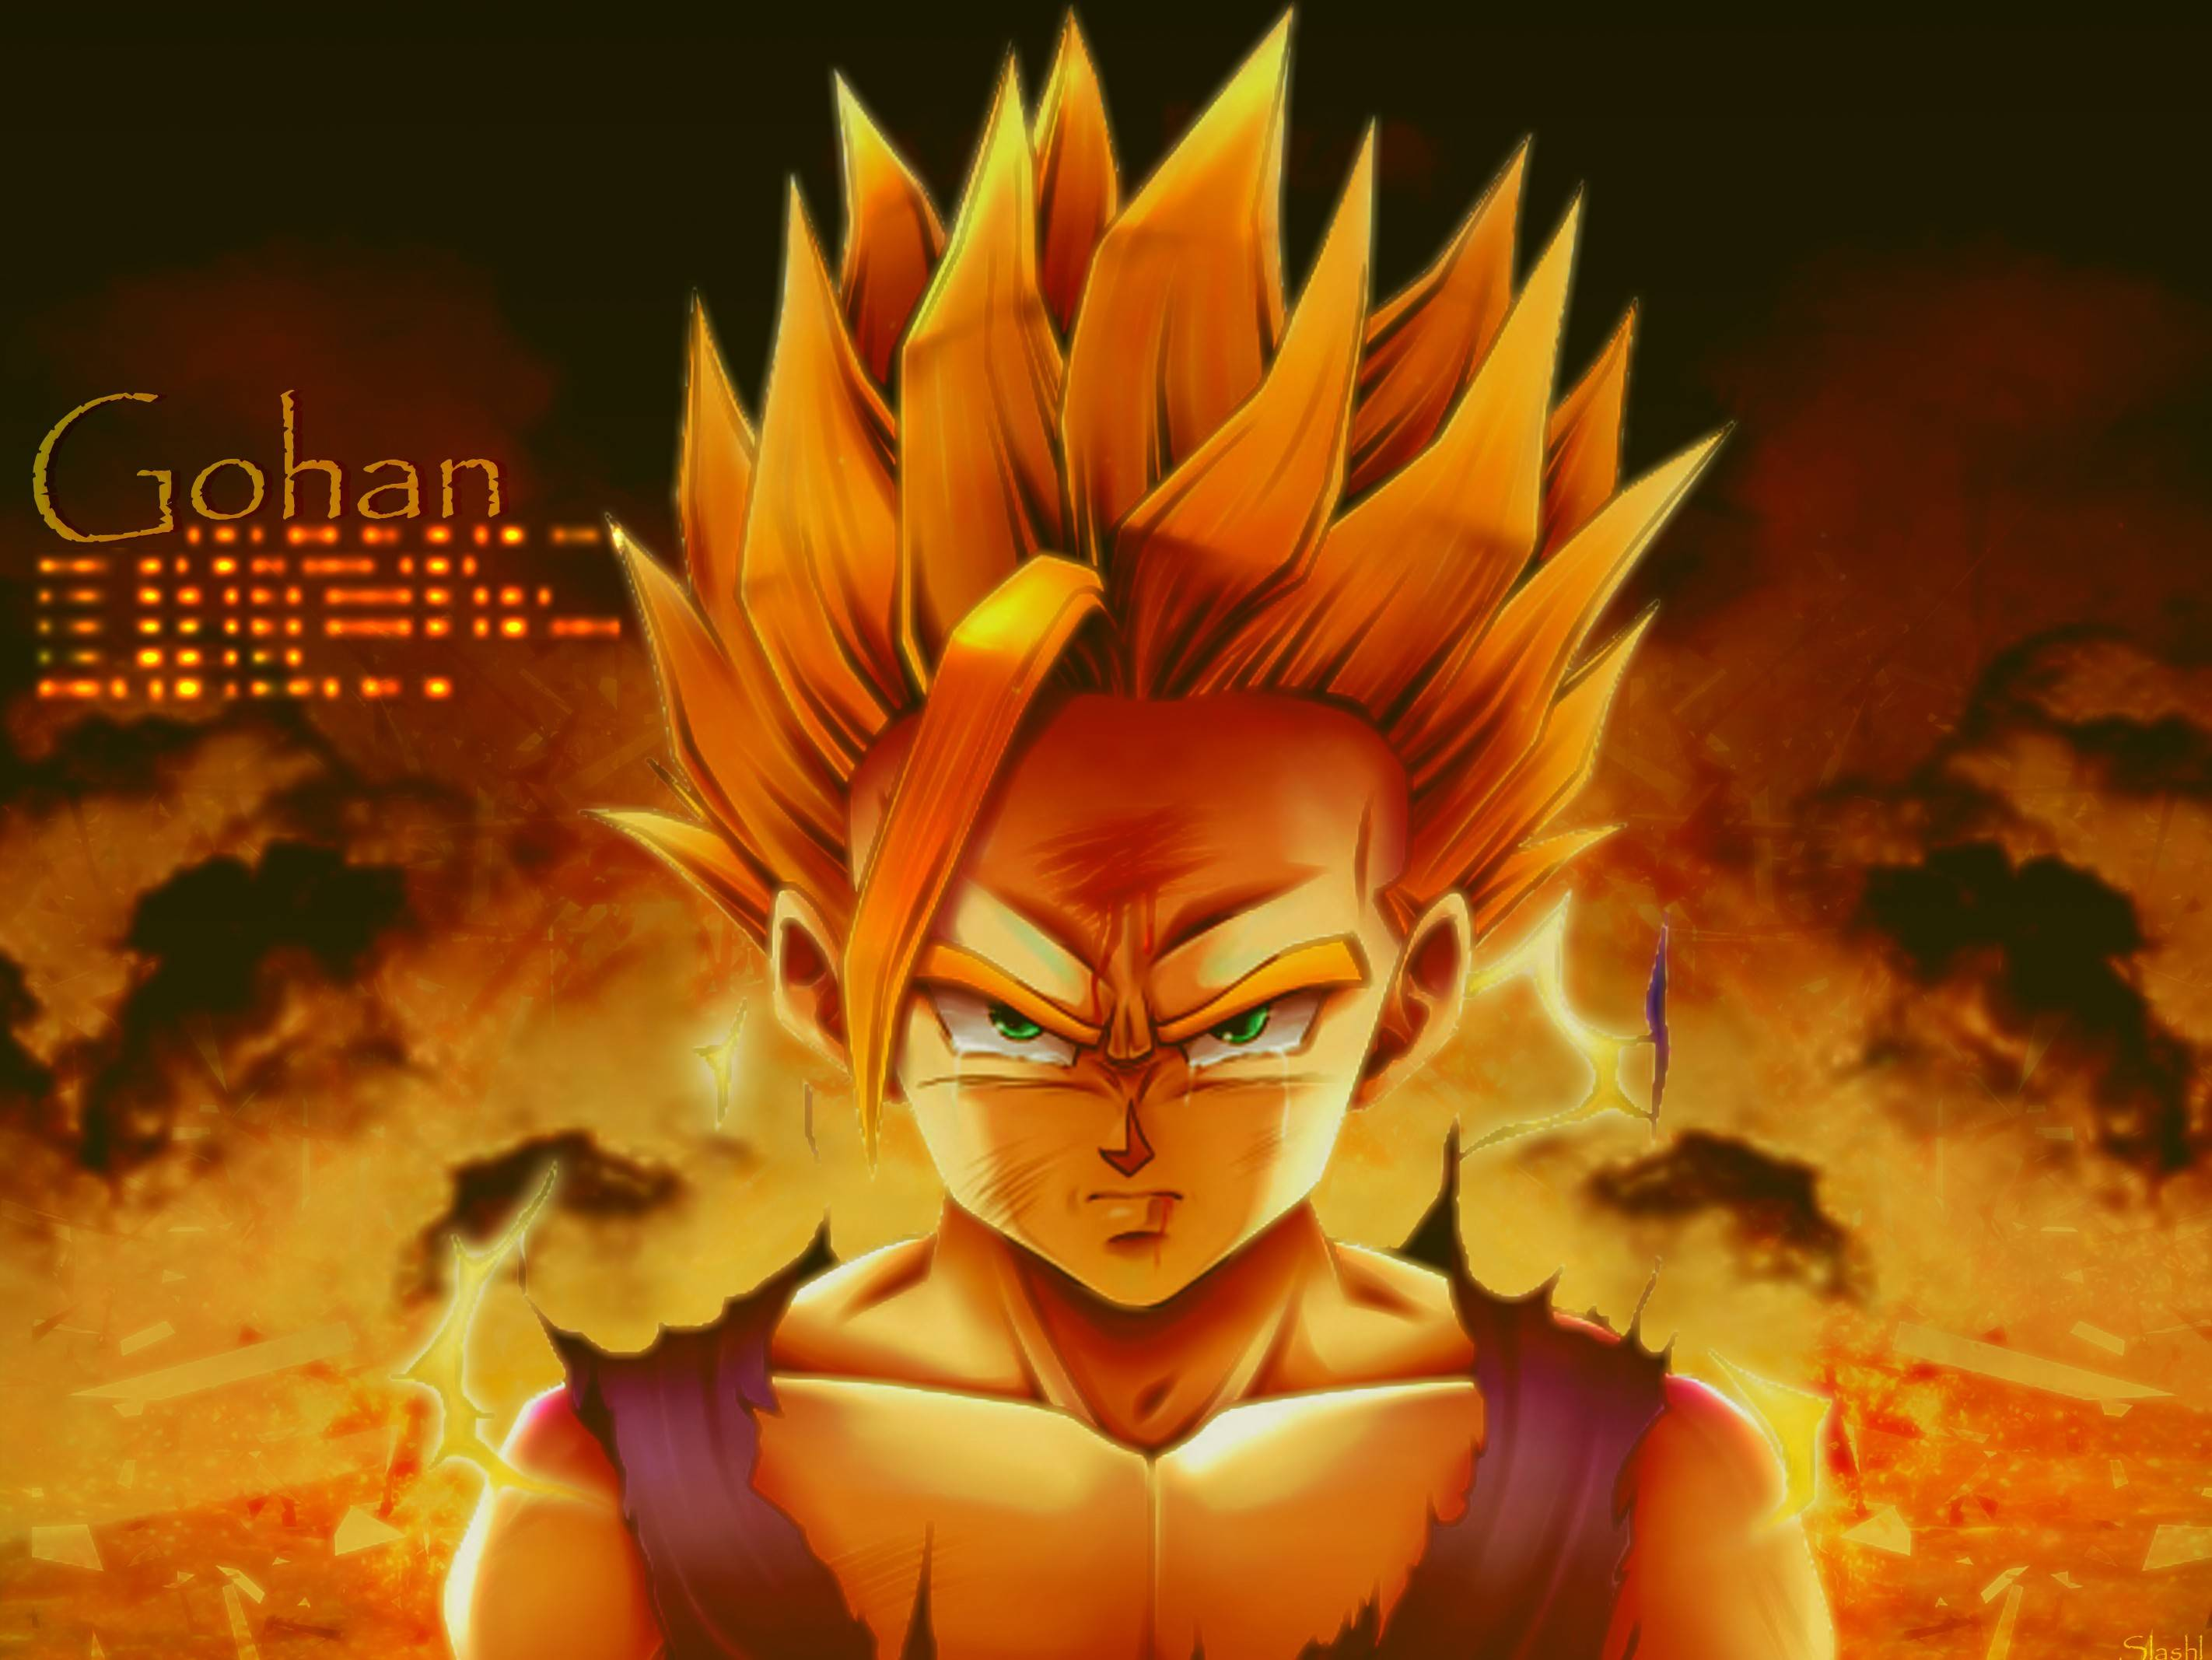 DBZ Wallpaper Gohan - WallpaperSafari Dragon Ball Z Goku Super Saiyan 6 Wallpapers